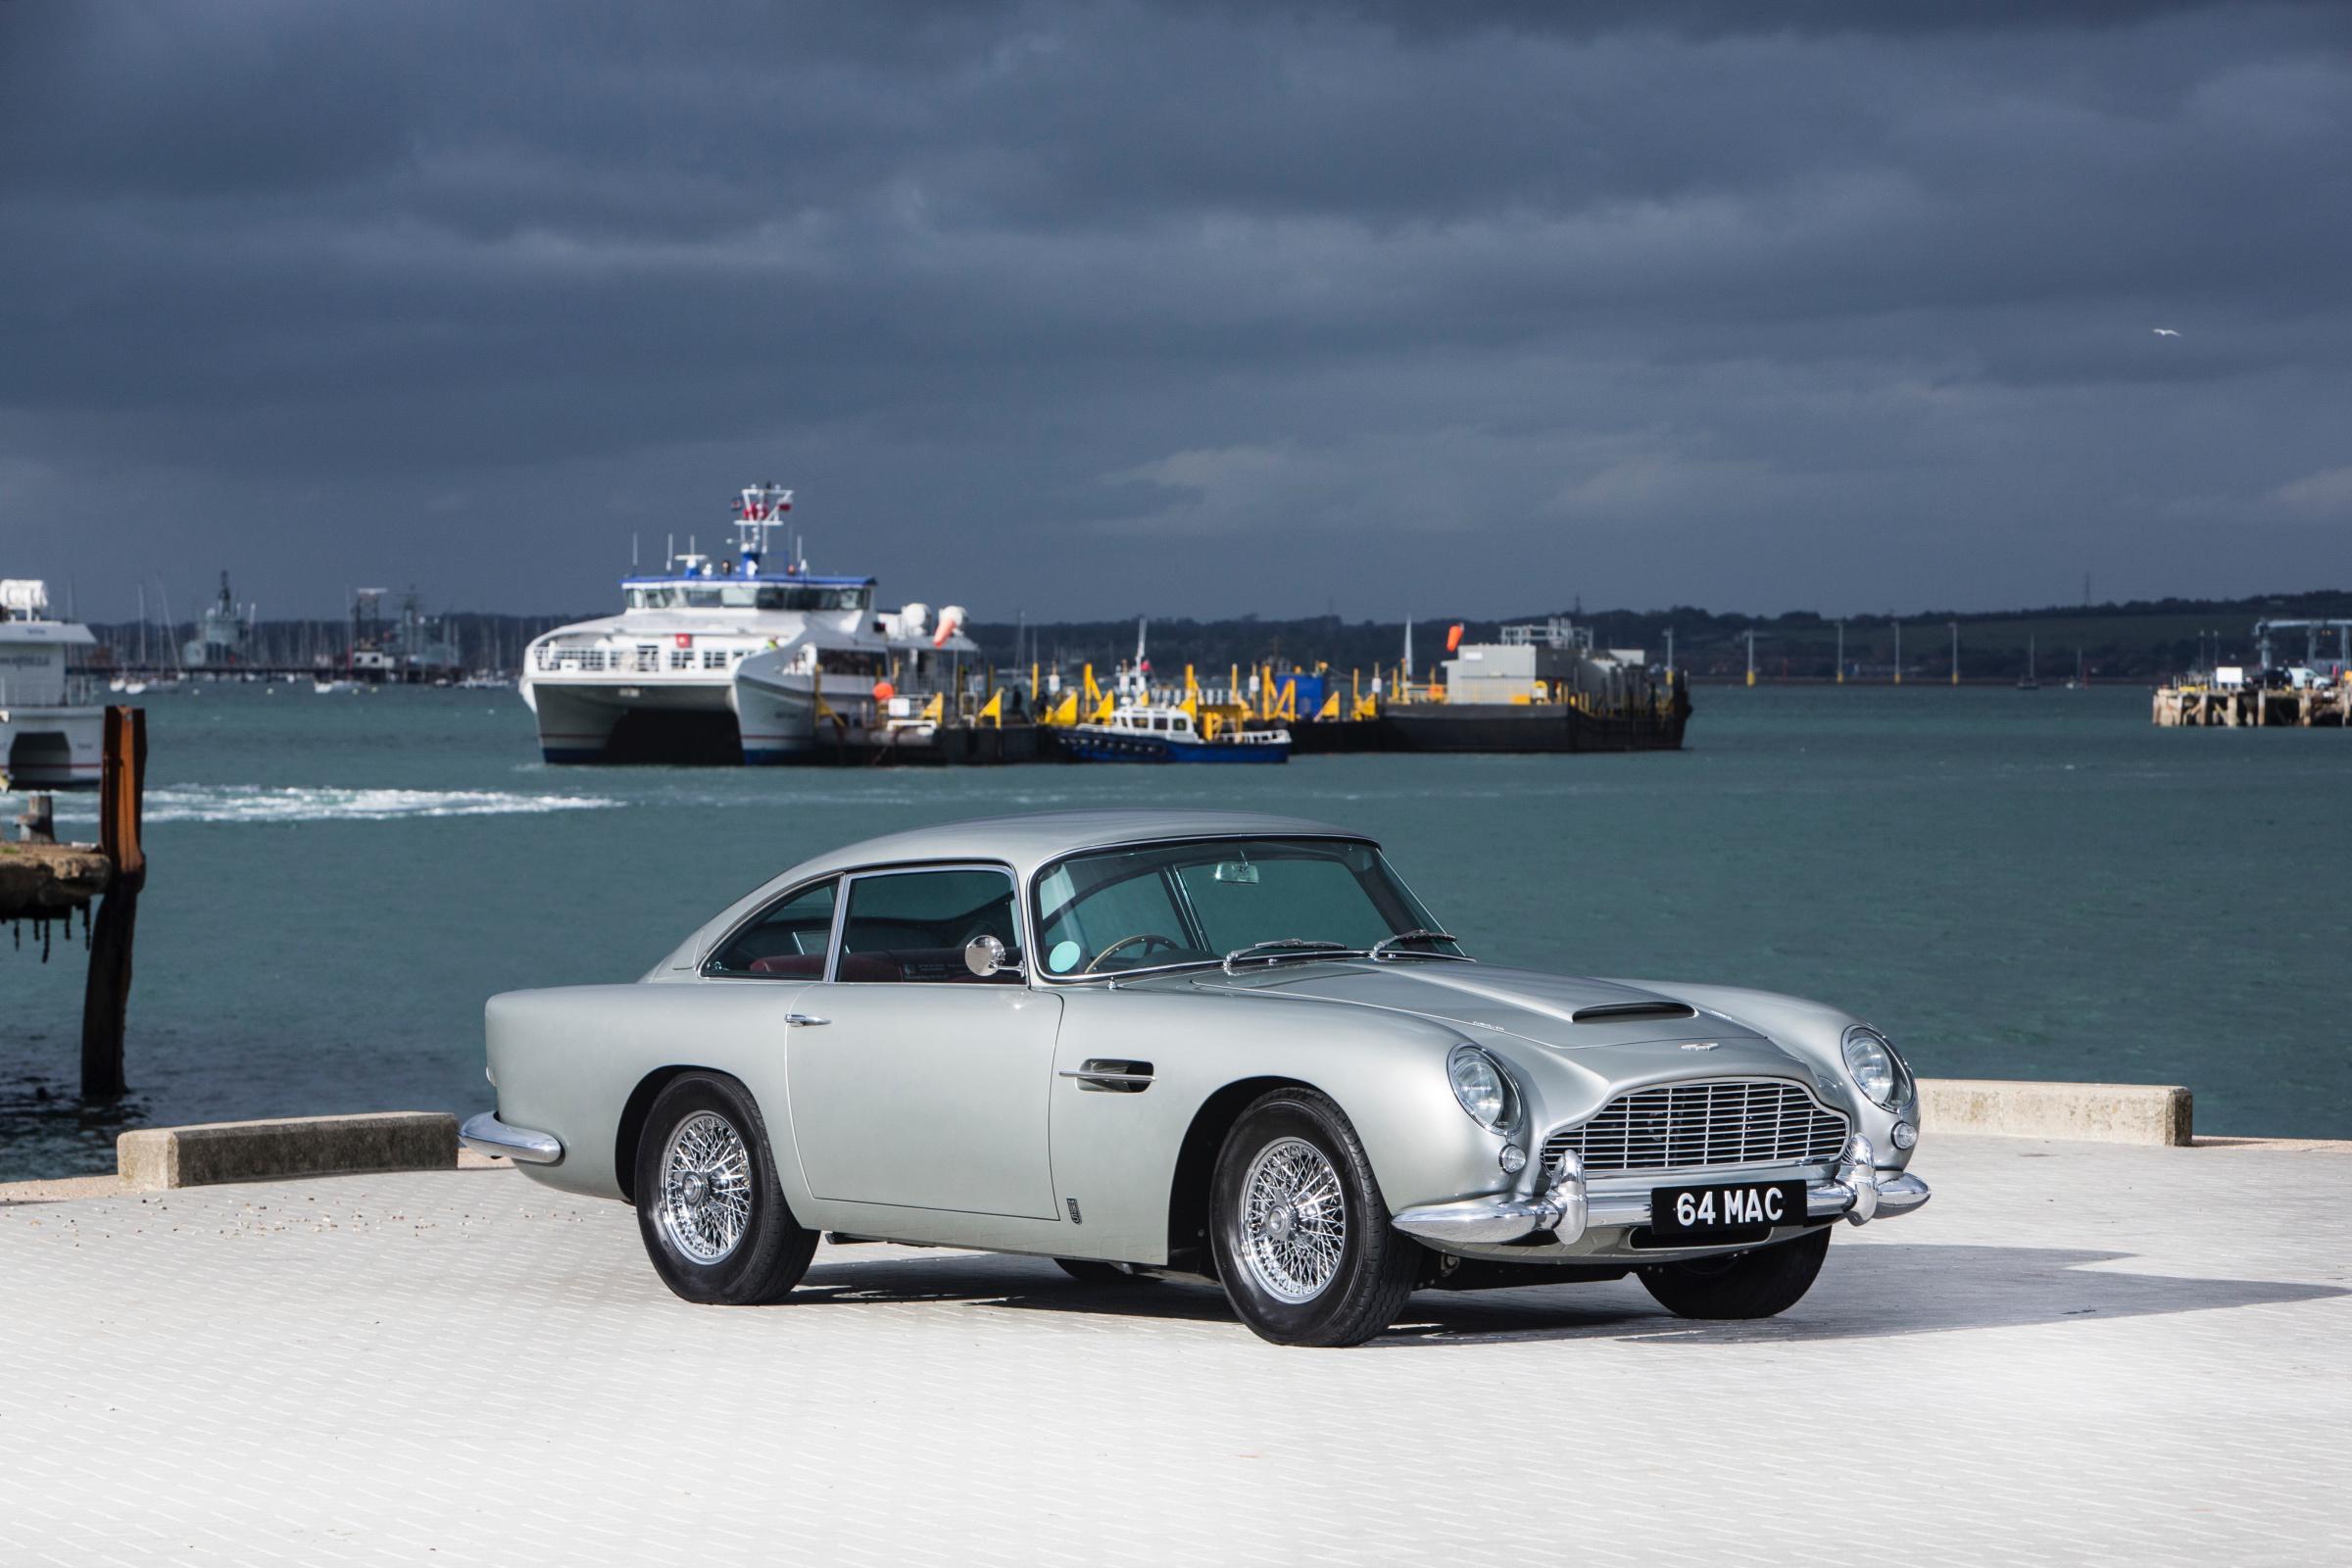 Paul Mccartney S Aston Martin Db5